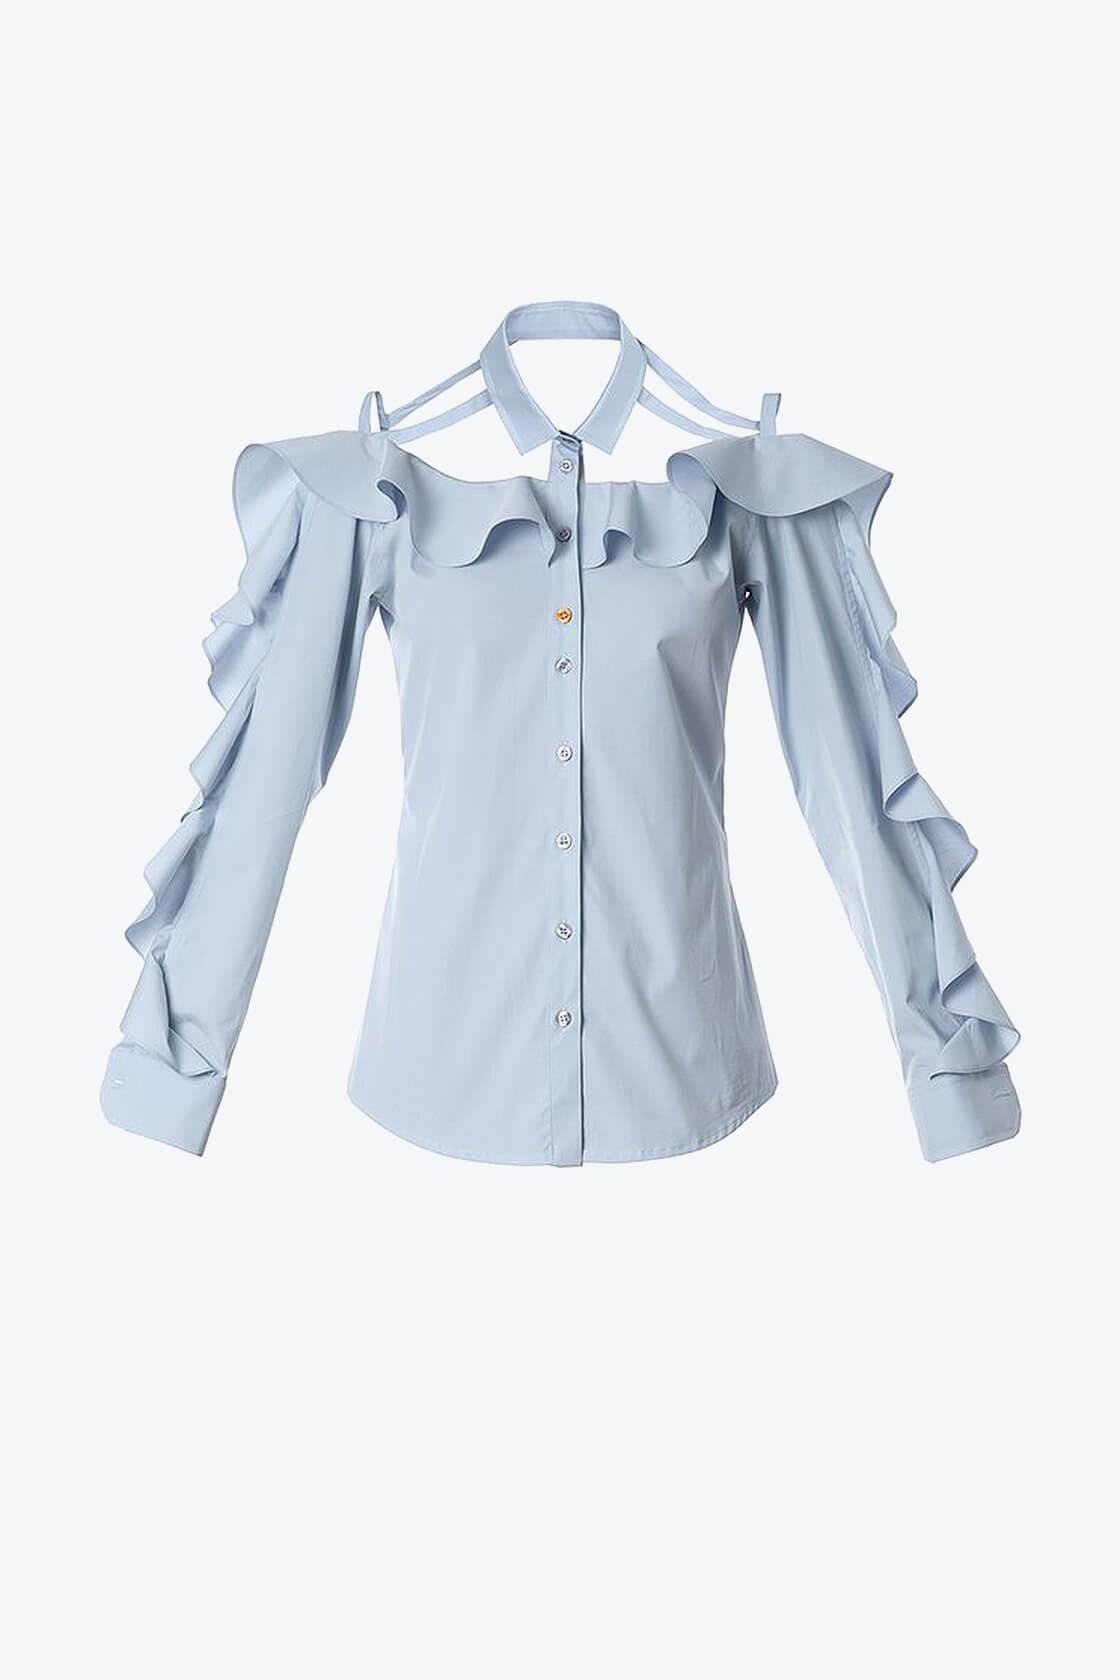 OL10000180 Ruffled bare shoulder shirt1